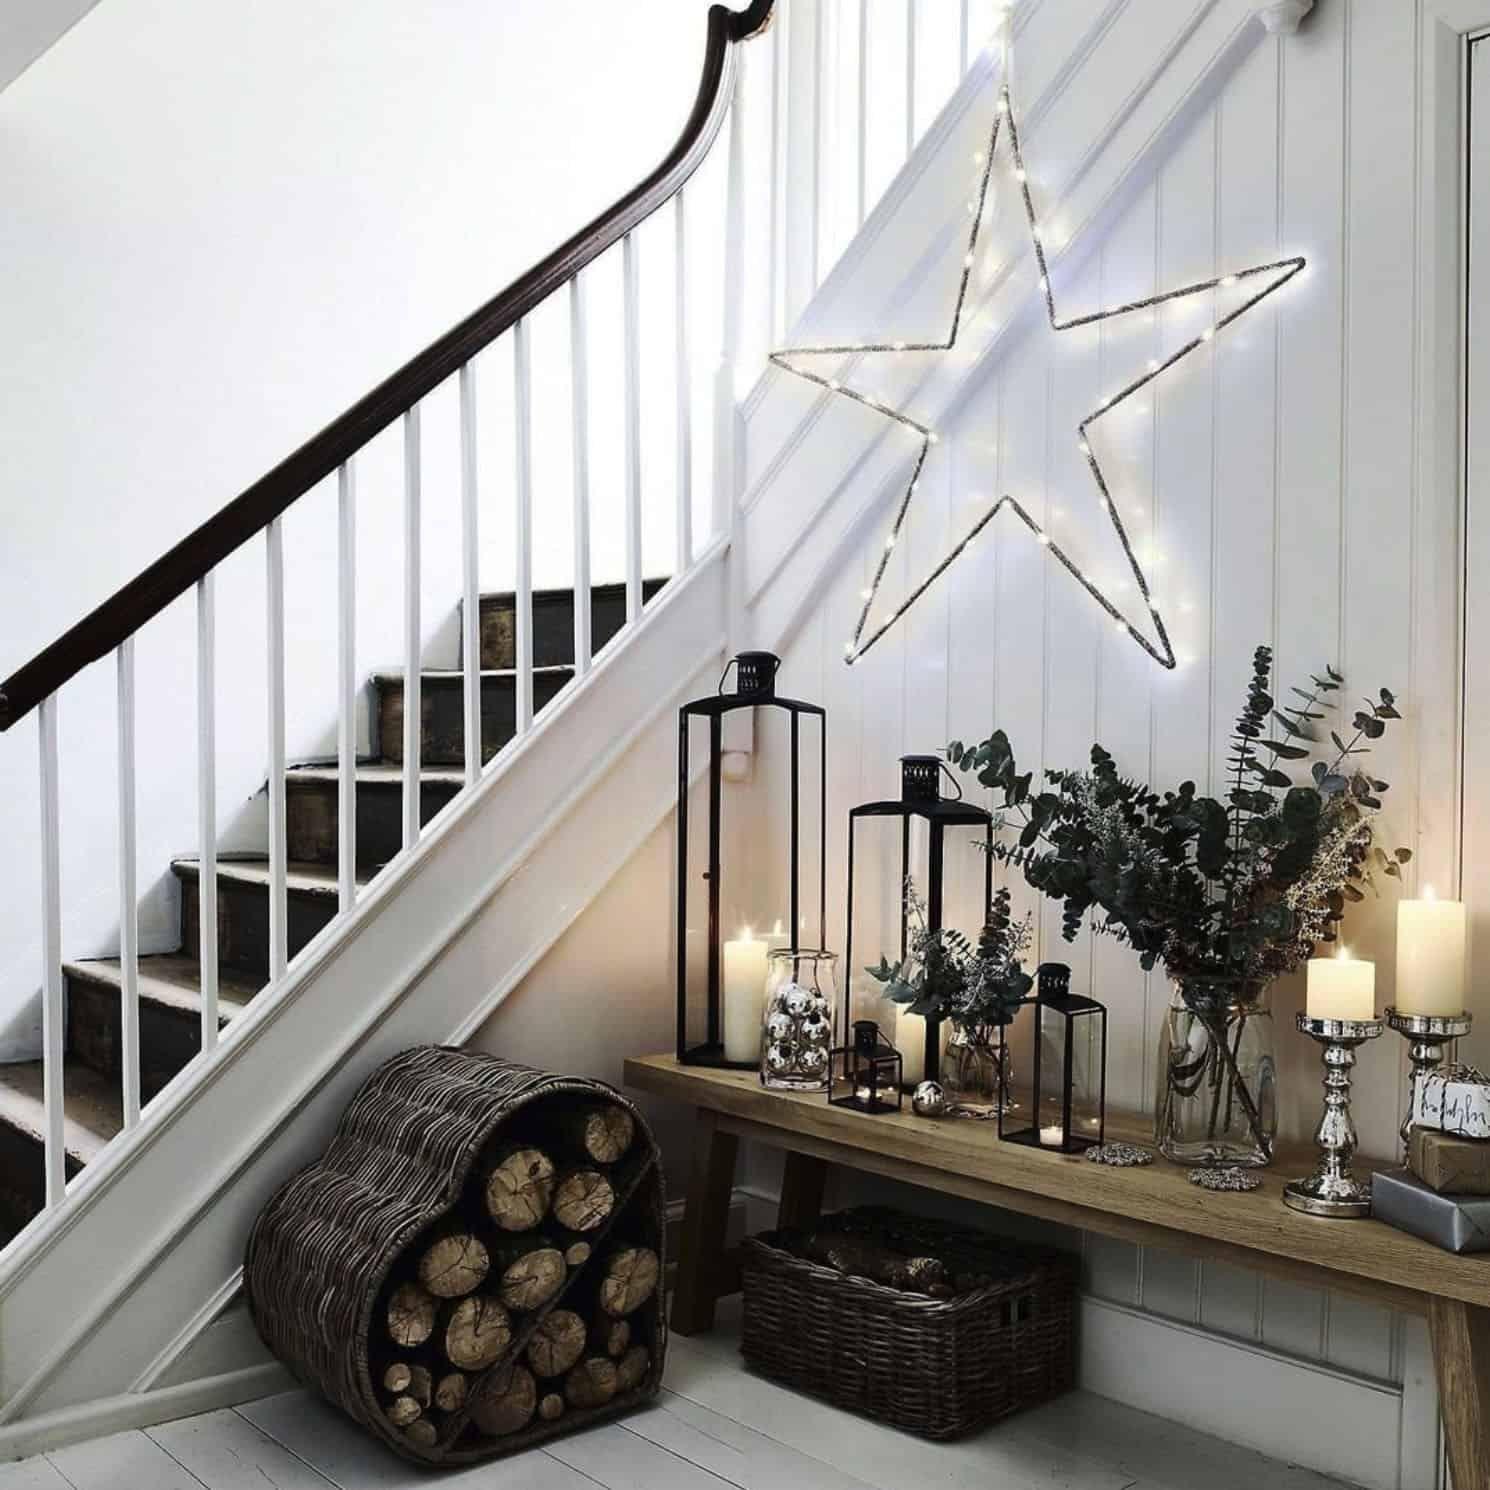 Have Yourself A Merry Christmas: 75 Ho-Ho-Holiday Decor Ideas